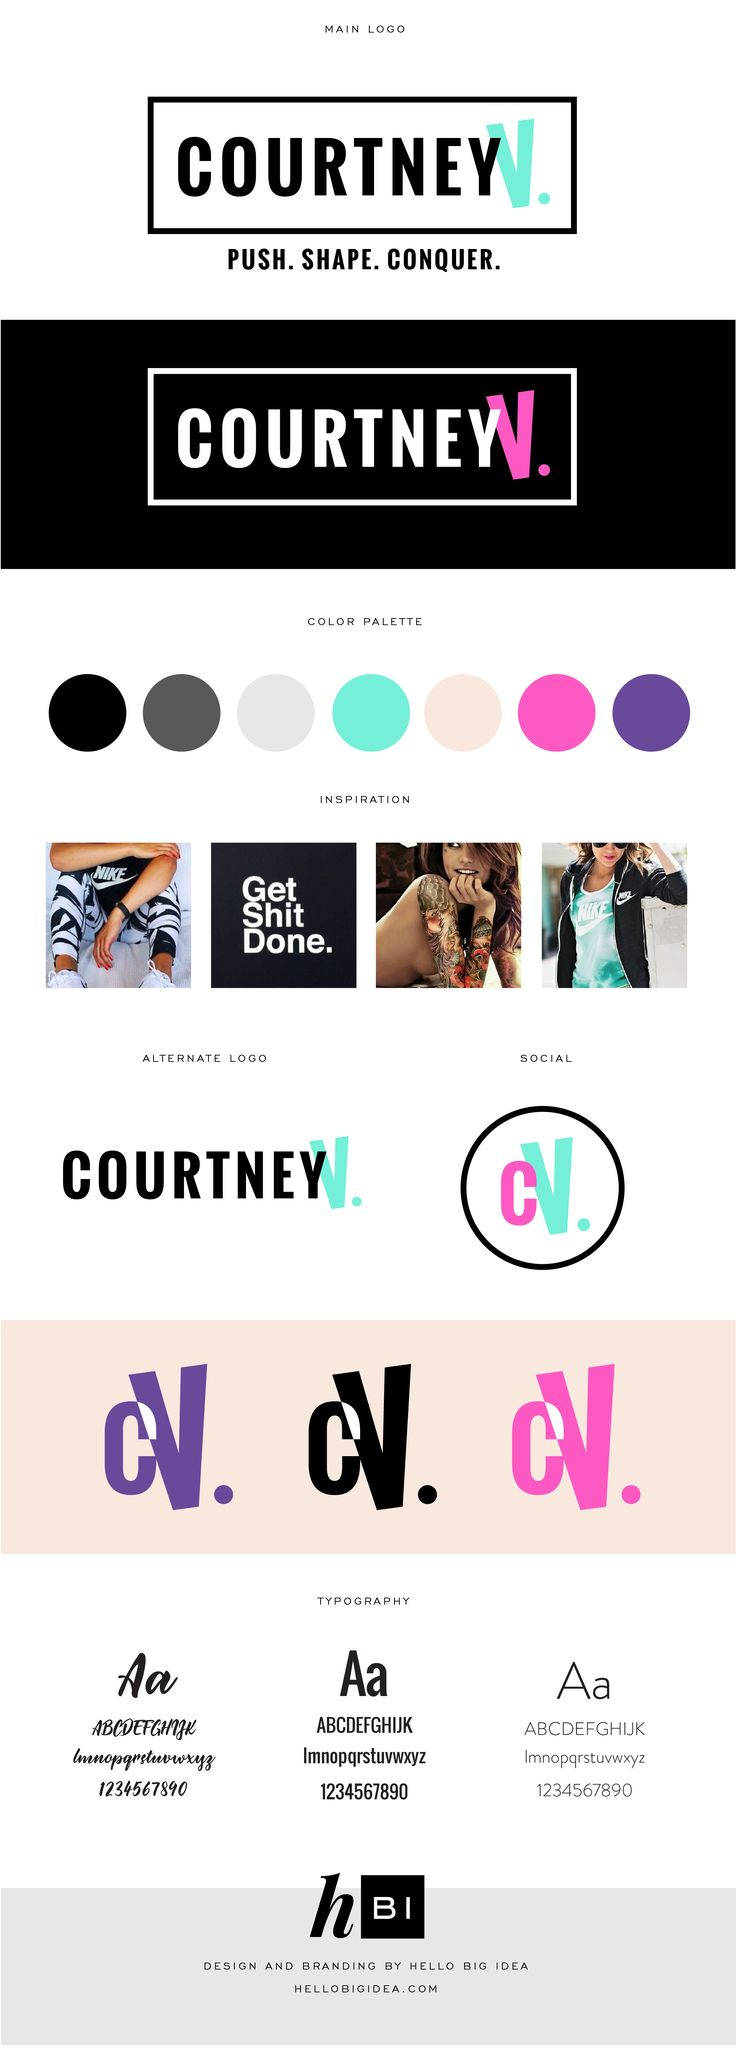 Brand Board and logo design for Courtney V. by Hello Big Idea